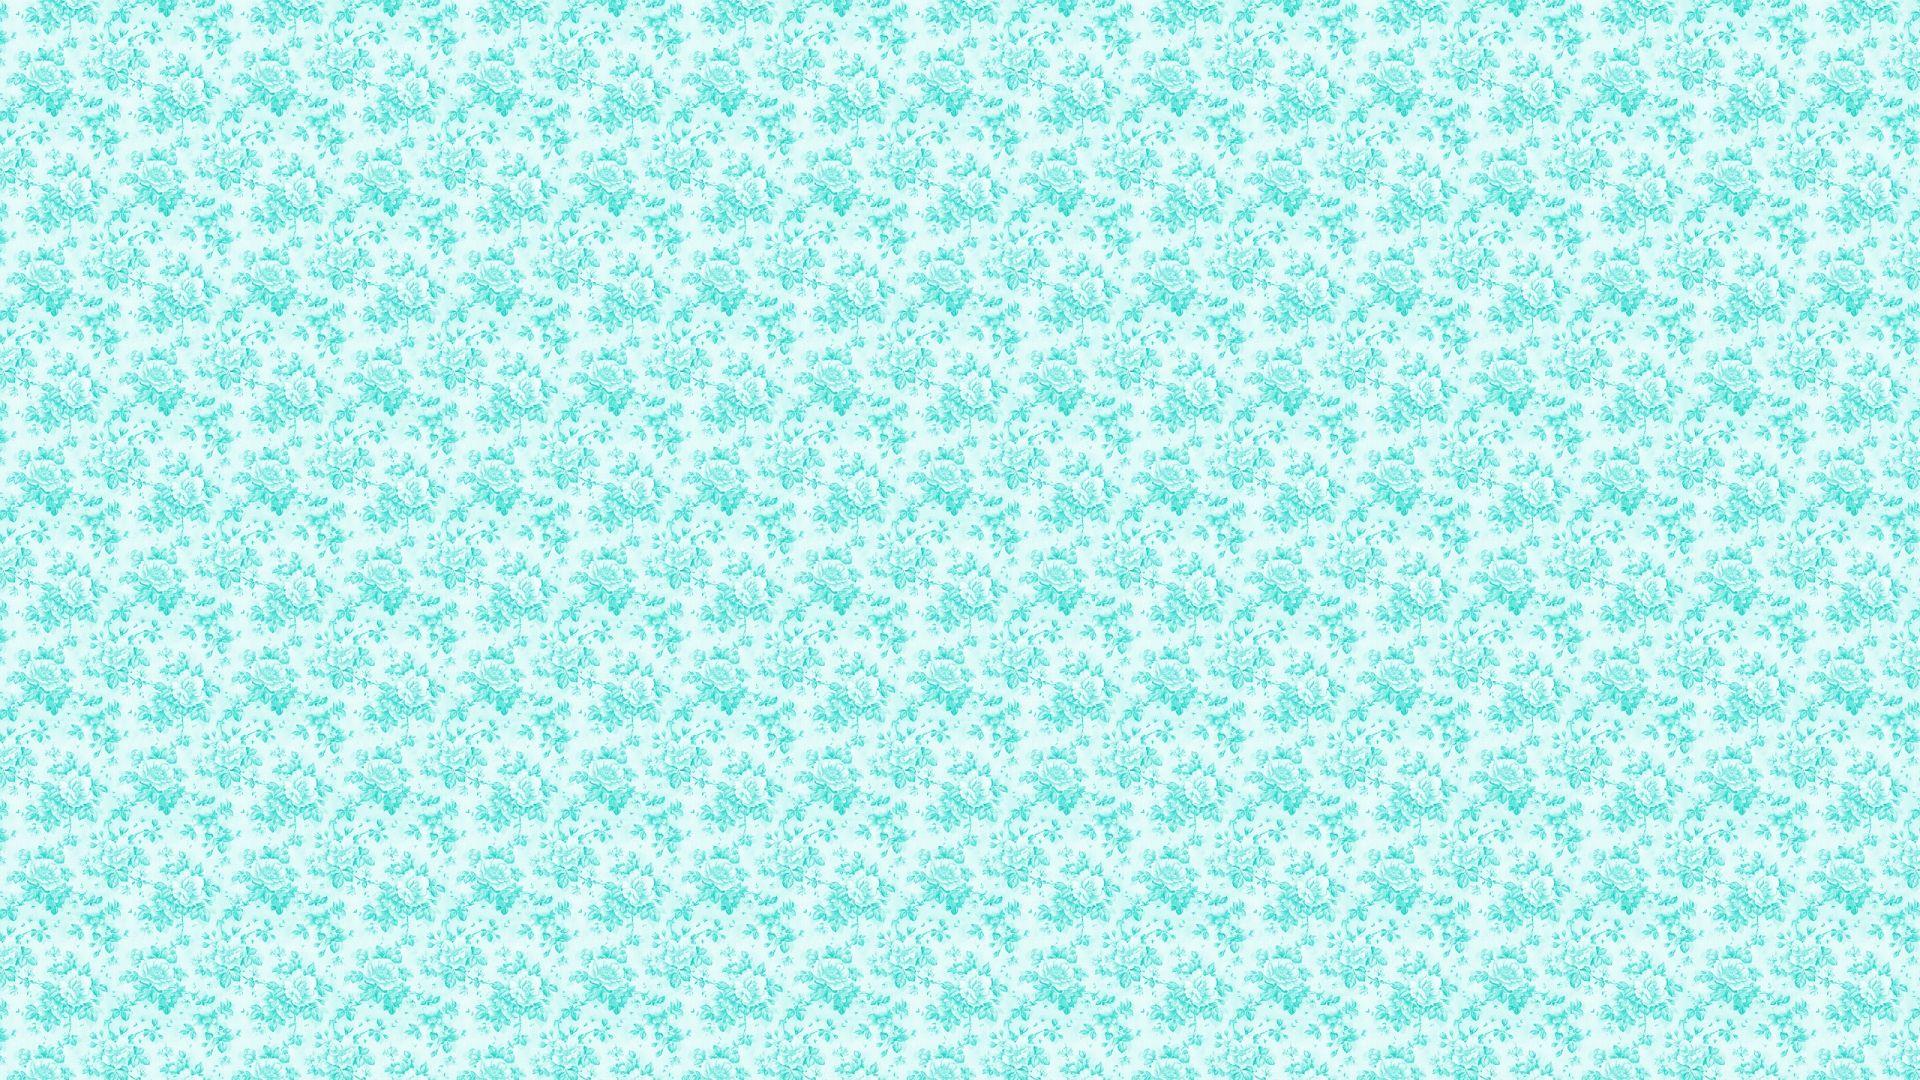 Cute Blue HD Wallpaper